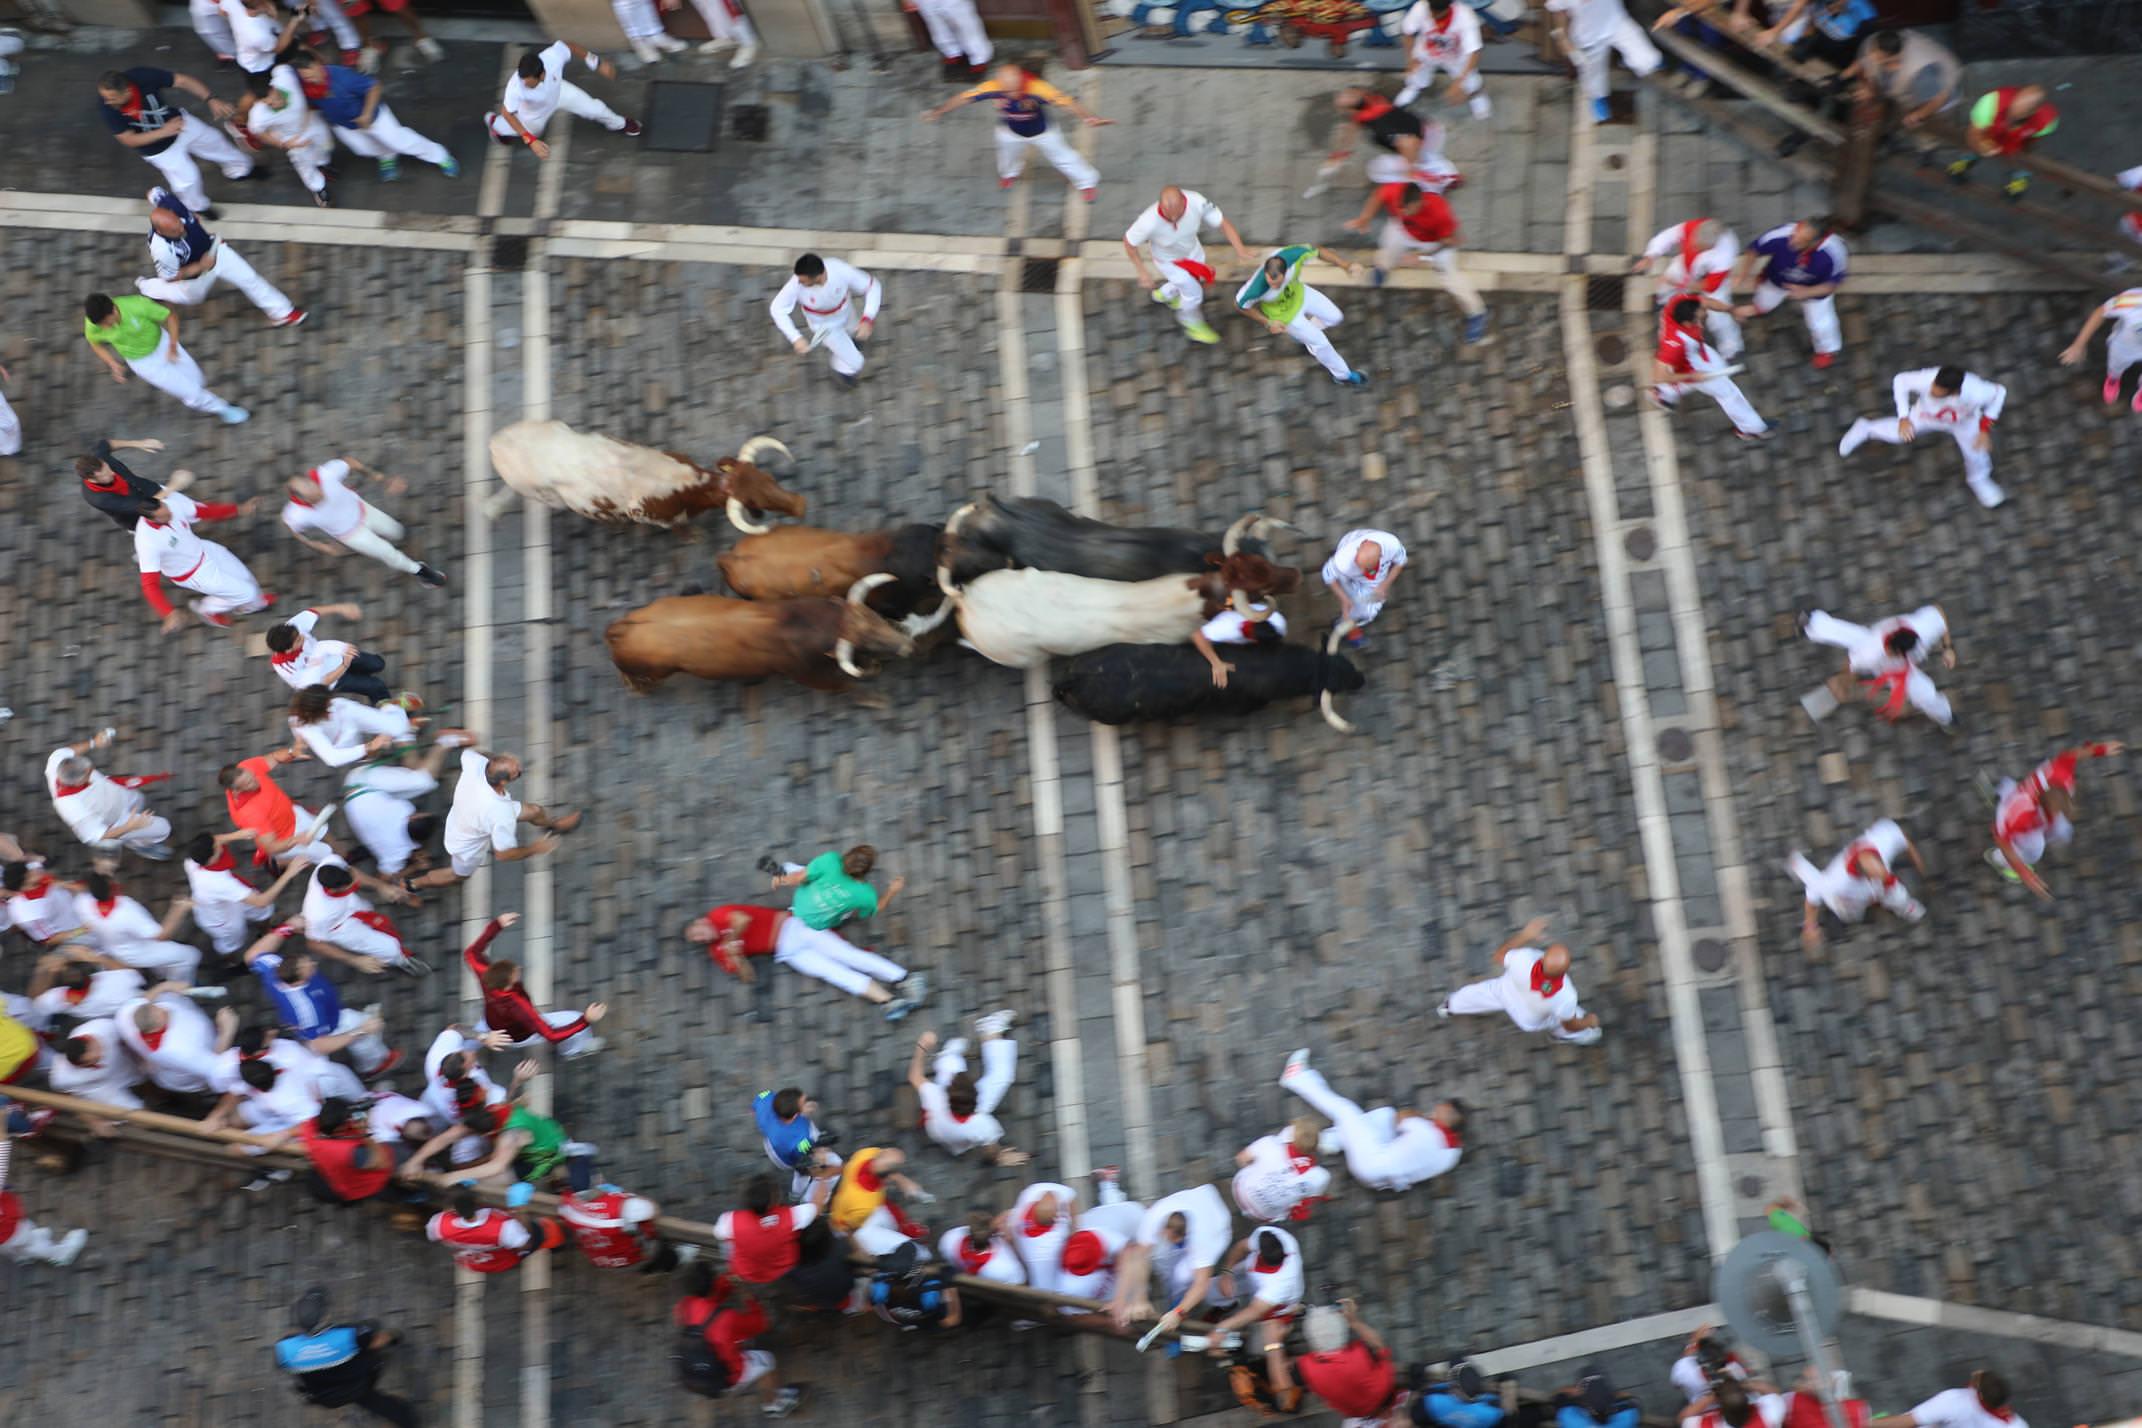 Spain navarre pamplona san fermin running bulls balcony estafeta